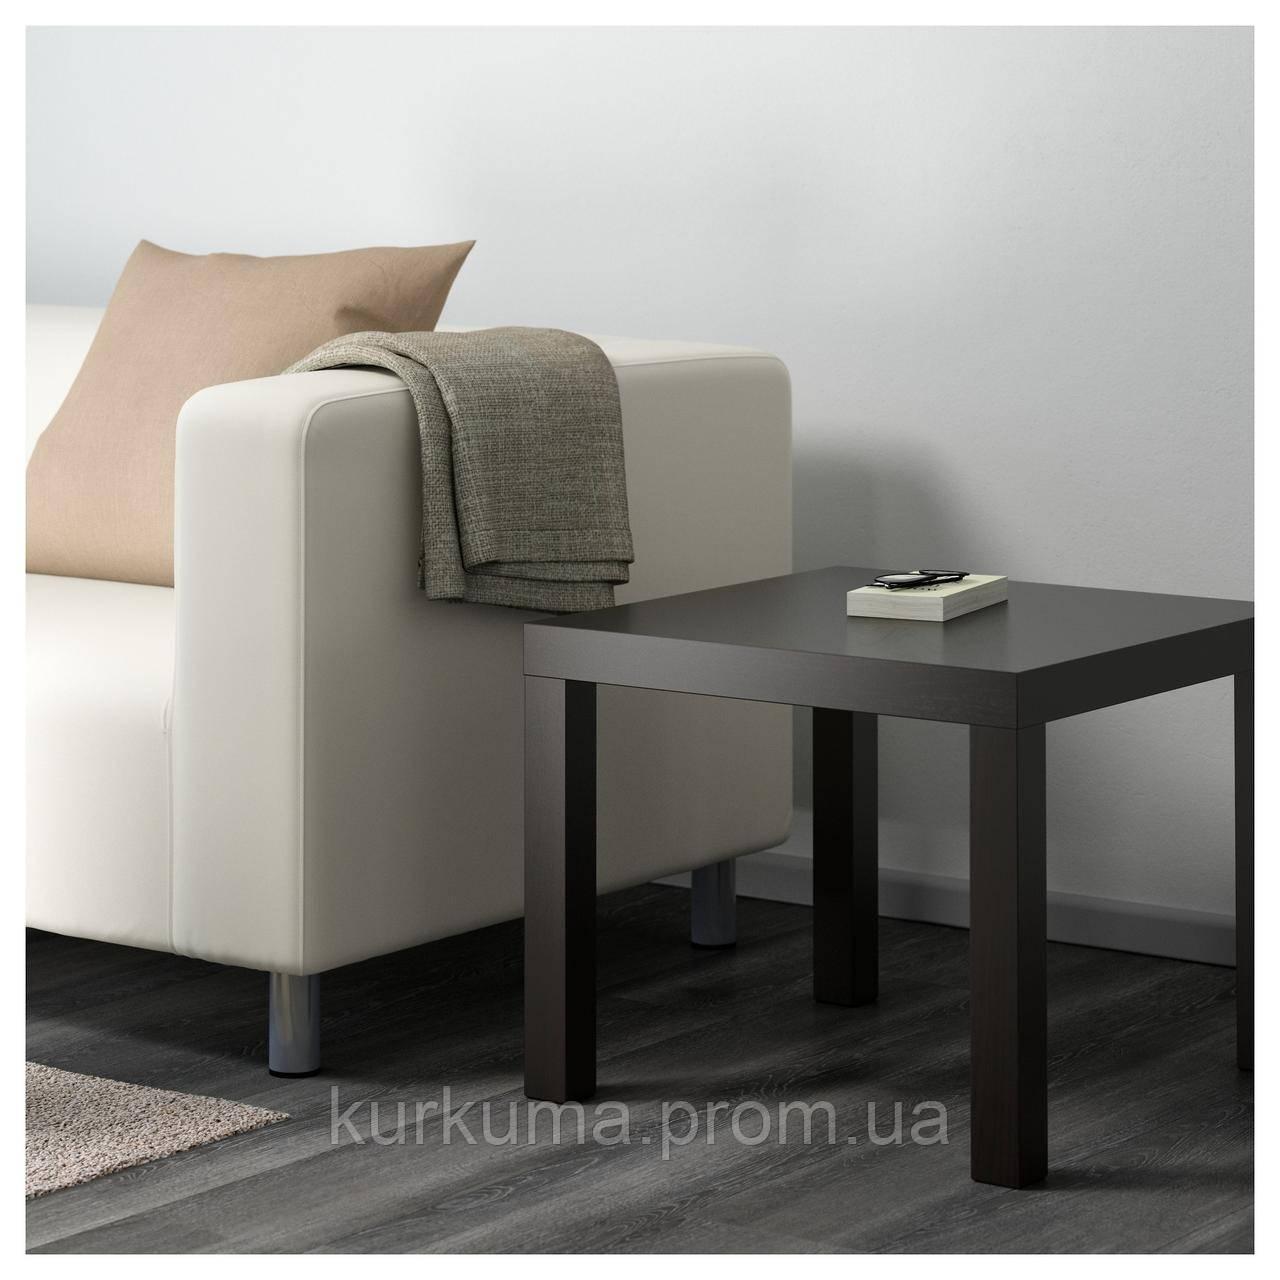 IKEA LACK Стол, черно-коричневый  (801.042.68)